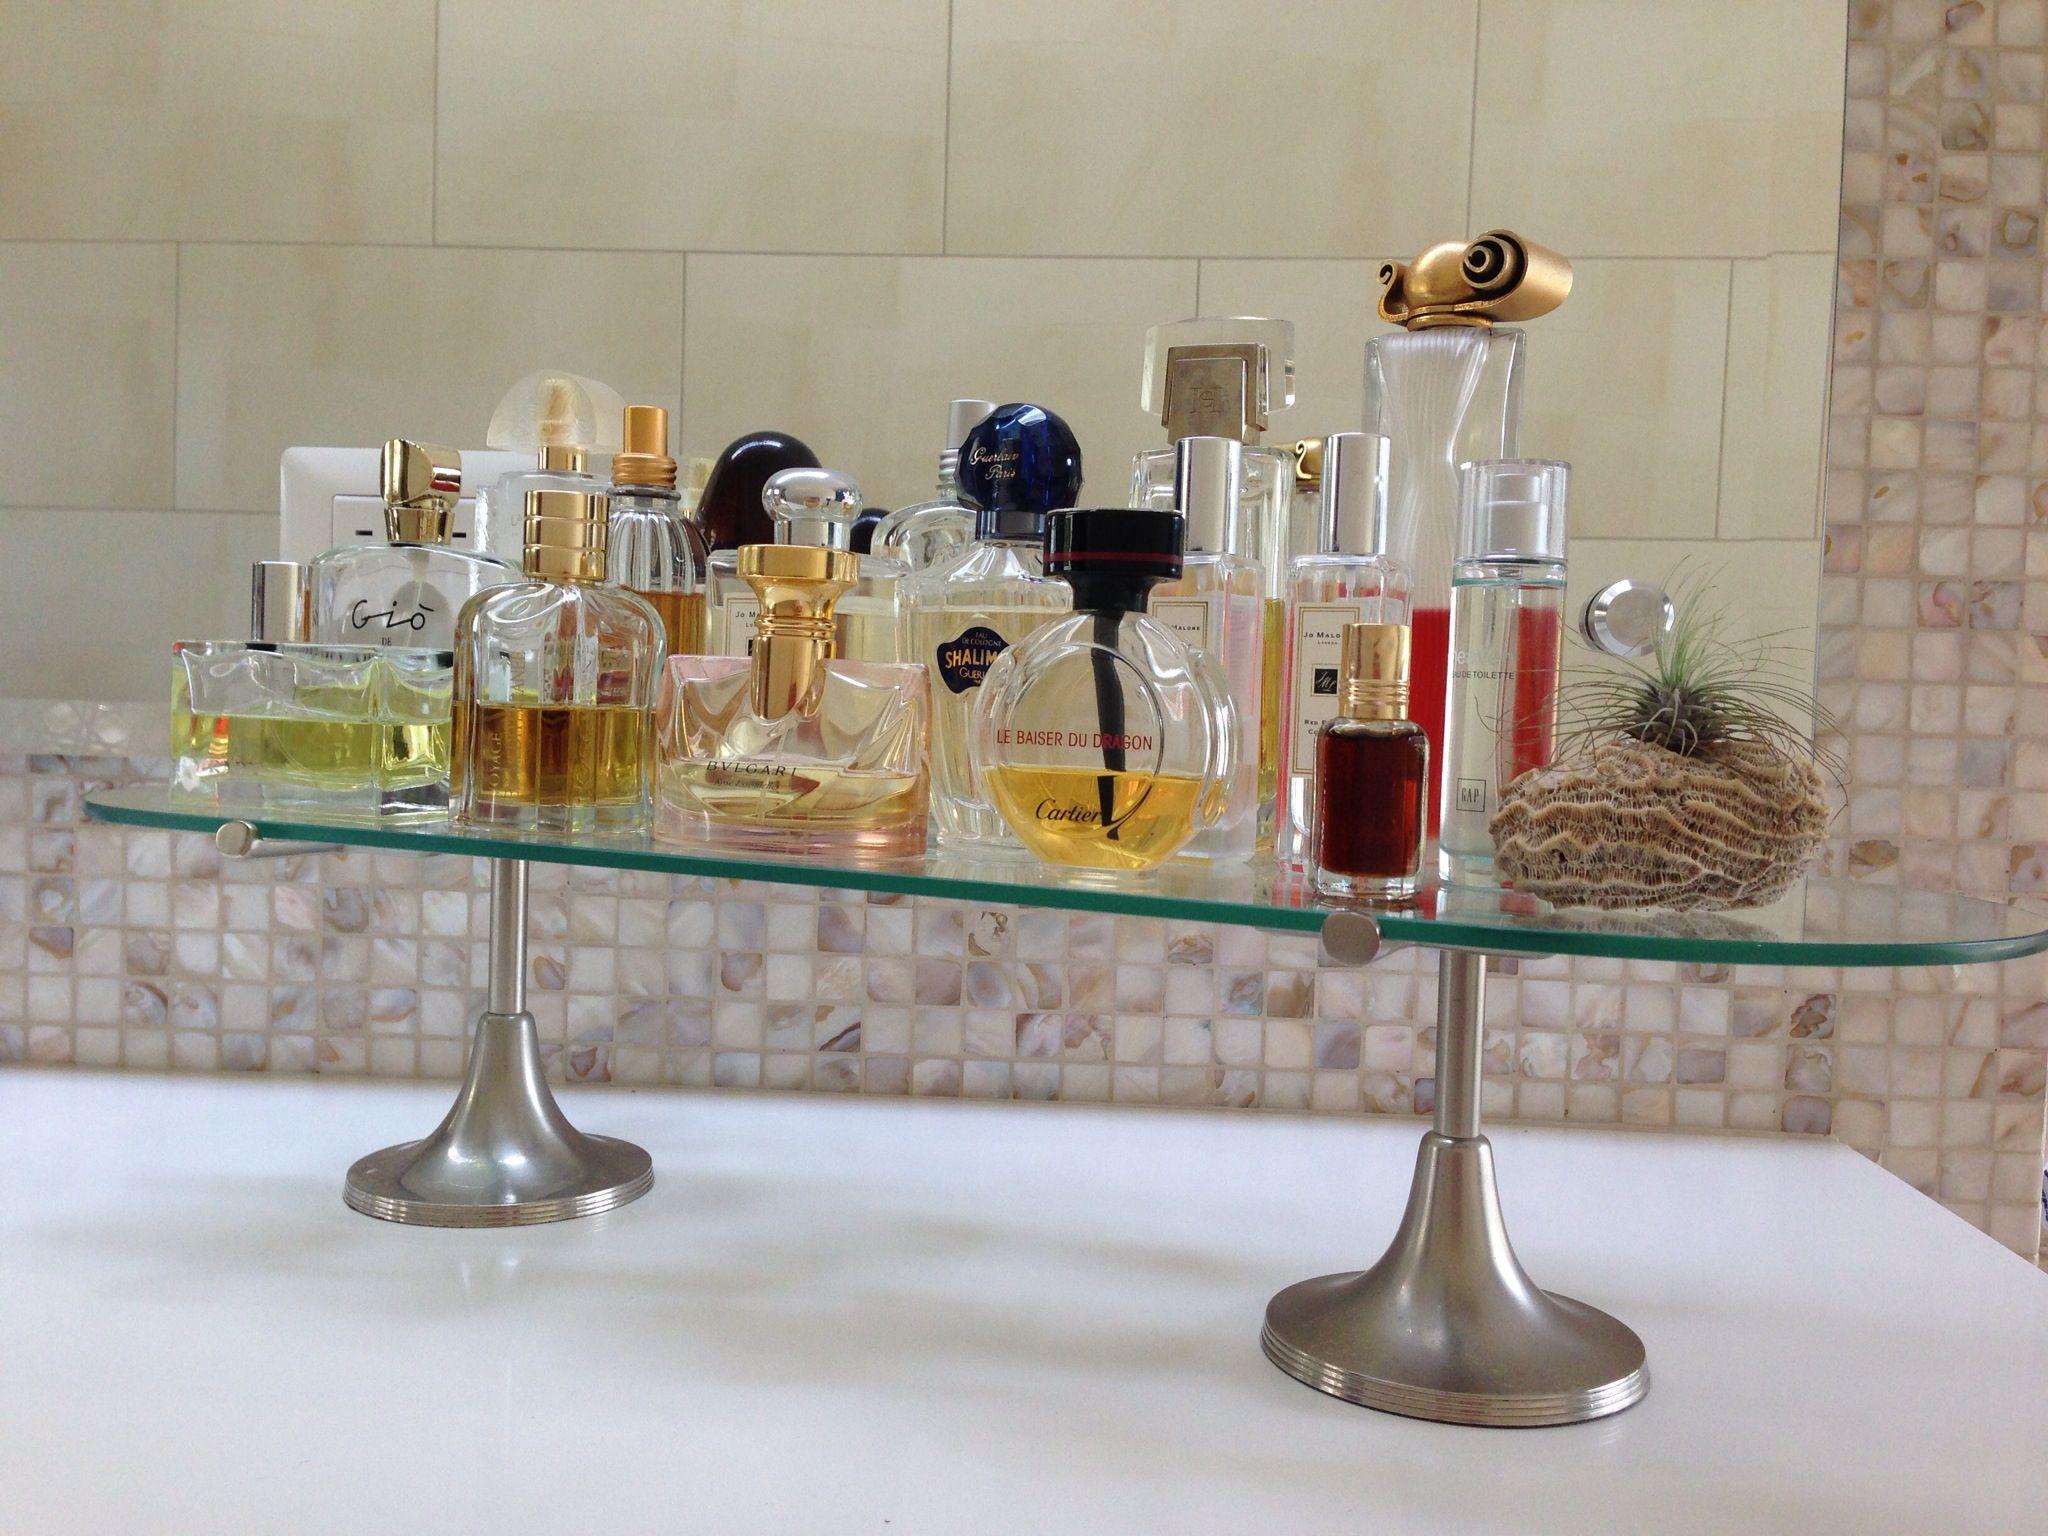 Pin By Karla M M On Home Perfume Display Perfume Storage Perfume Collection Display